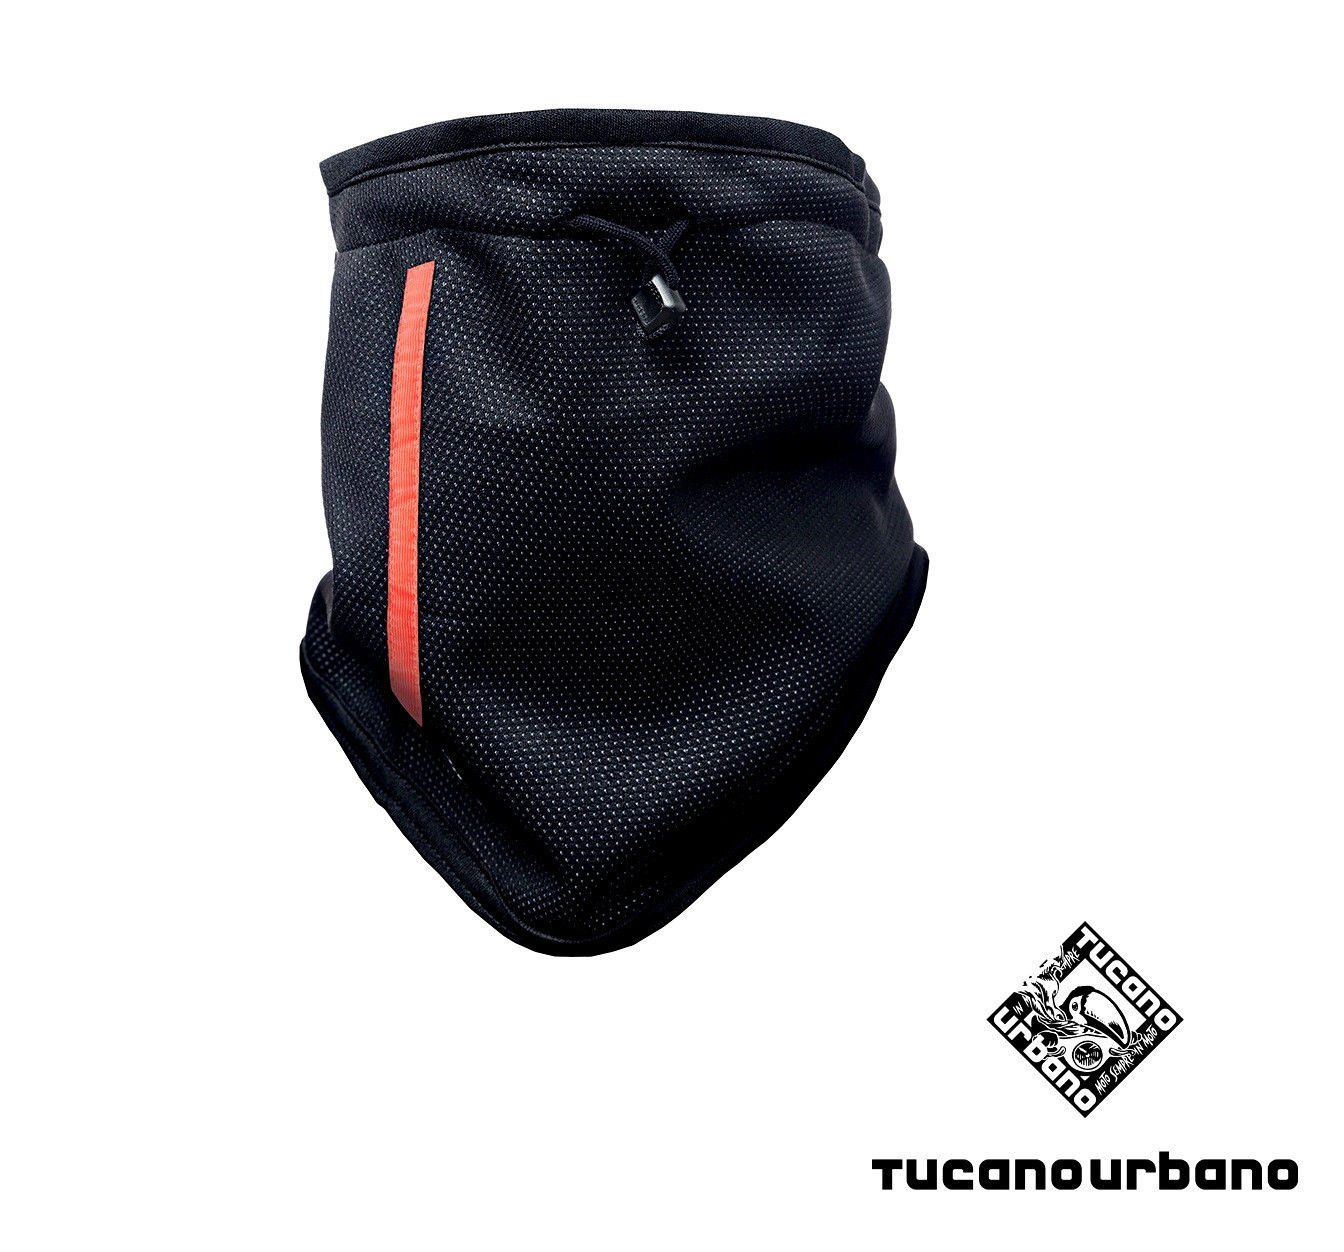 Collare Scaldacollo Paragola Antivento Windbreacker Pile Tucano Urbano 615WB